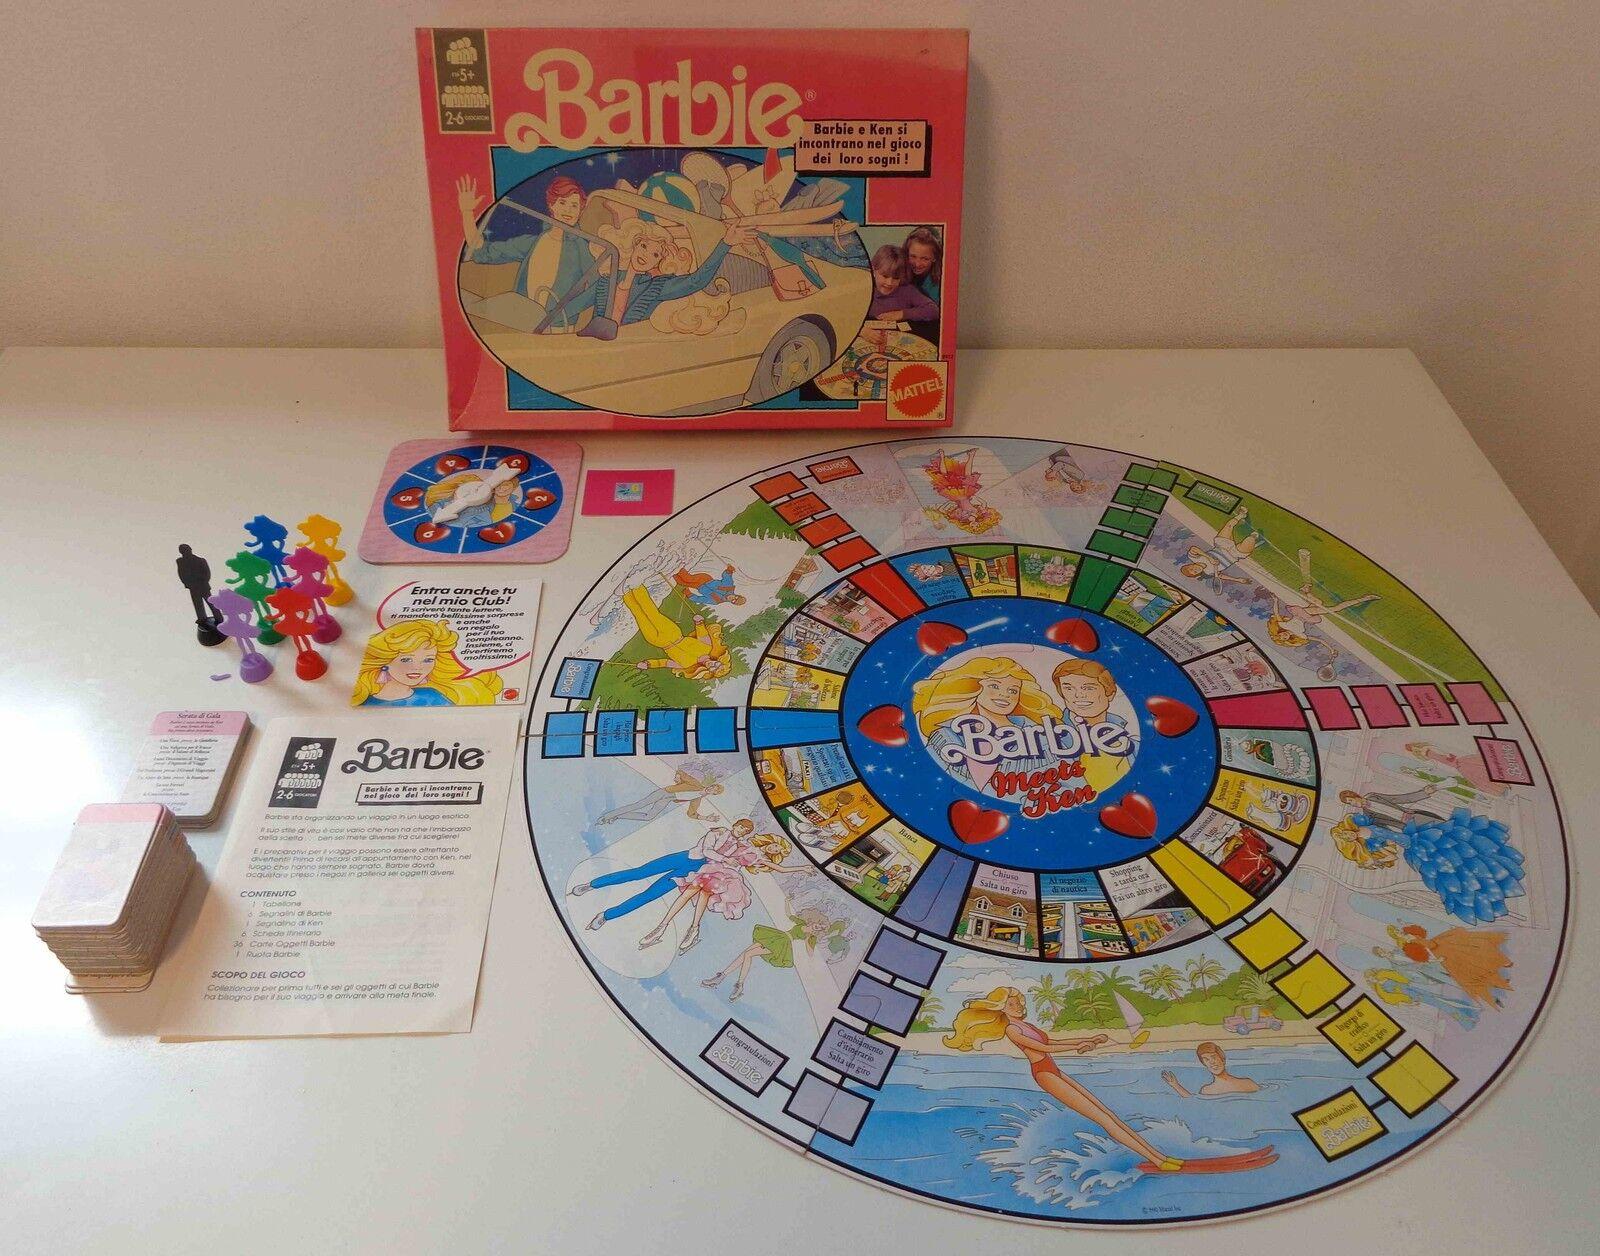 Gioco in Scatola Vintage Board Game Italiano Italiano Italiano 1990 Mattel BARBIE Ken ITA Bambola 398637